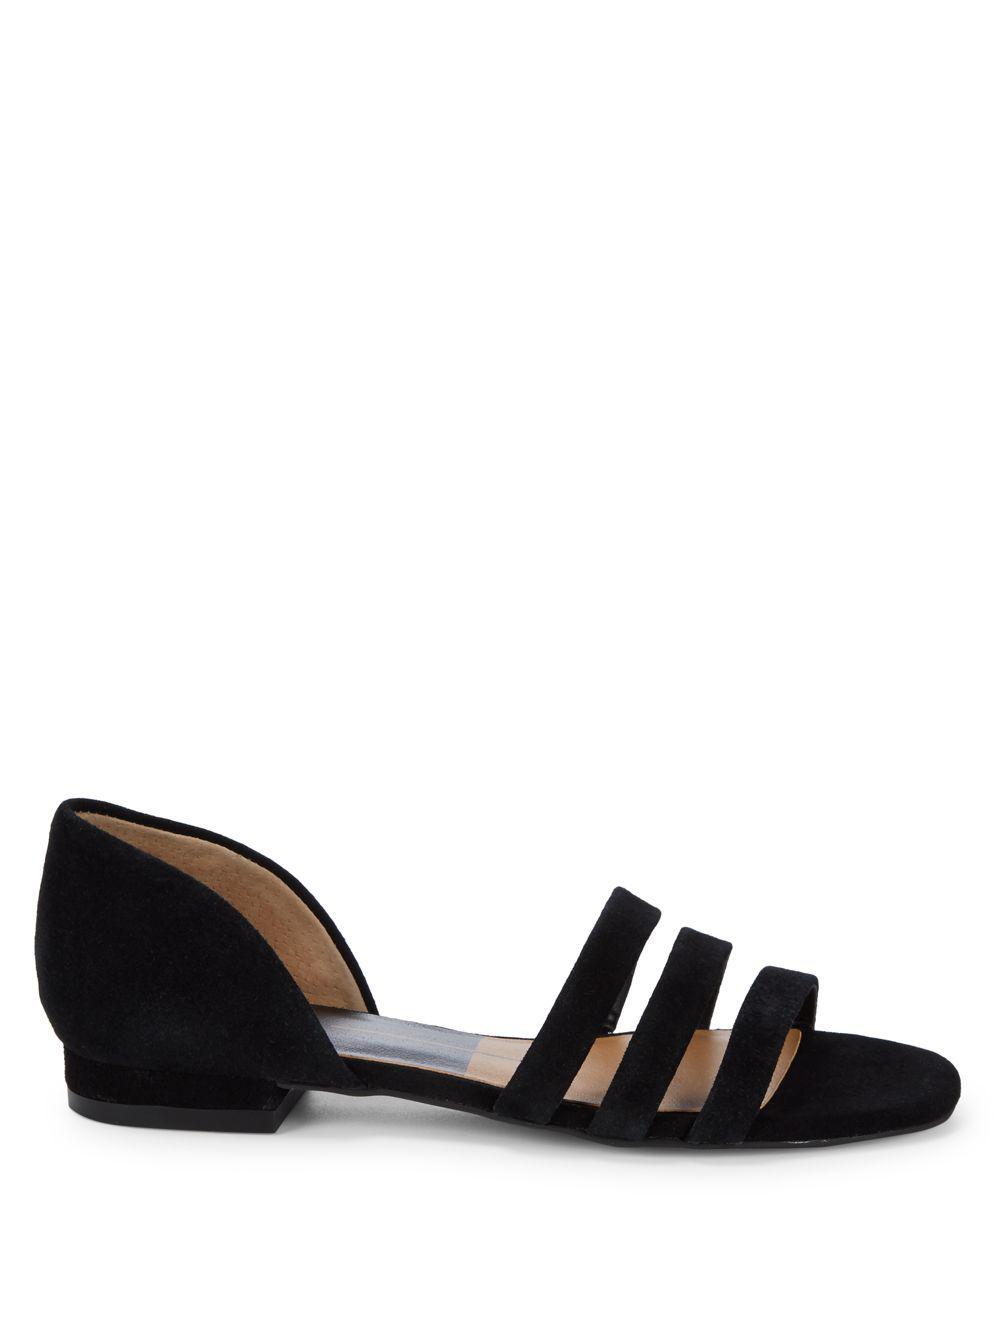 c206318e5a3f Lyst - Dolce Vita Deidra Three-strap Leather Sandals in Black